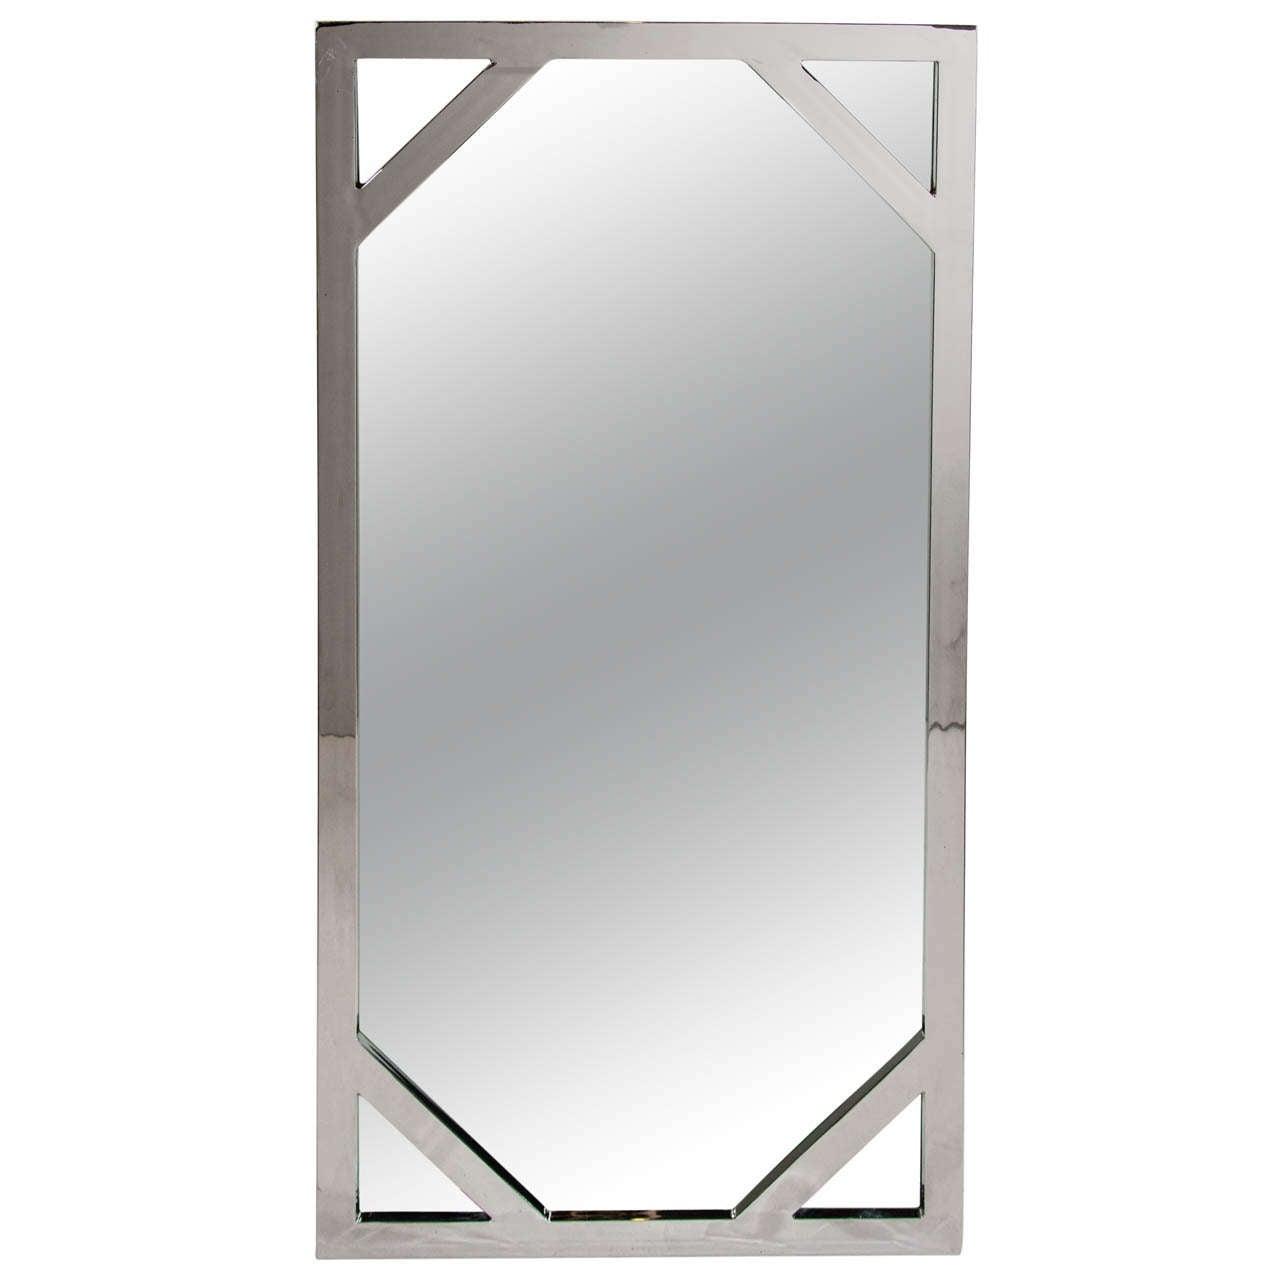 Mid-Century Modern Chromed Mirror Attributed to Milo Baughman